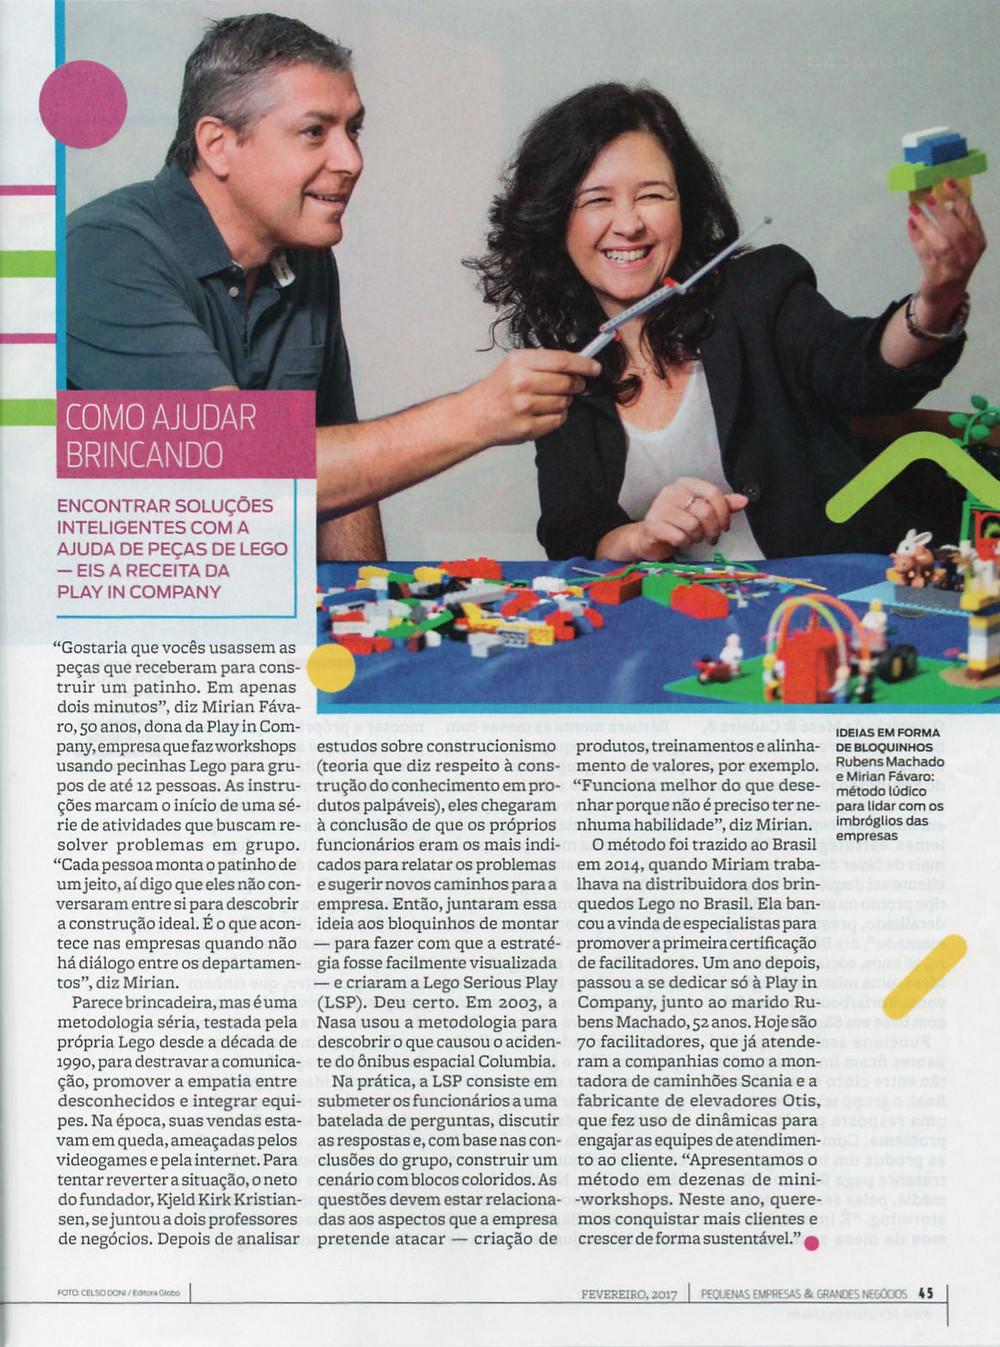 consultoria inovadora play in company lego serious play pequenas empresas grandes negócios